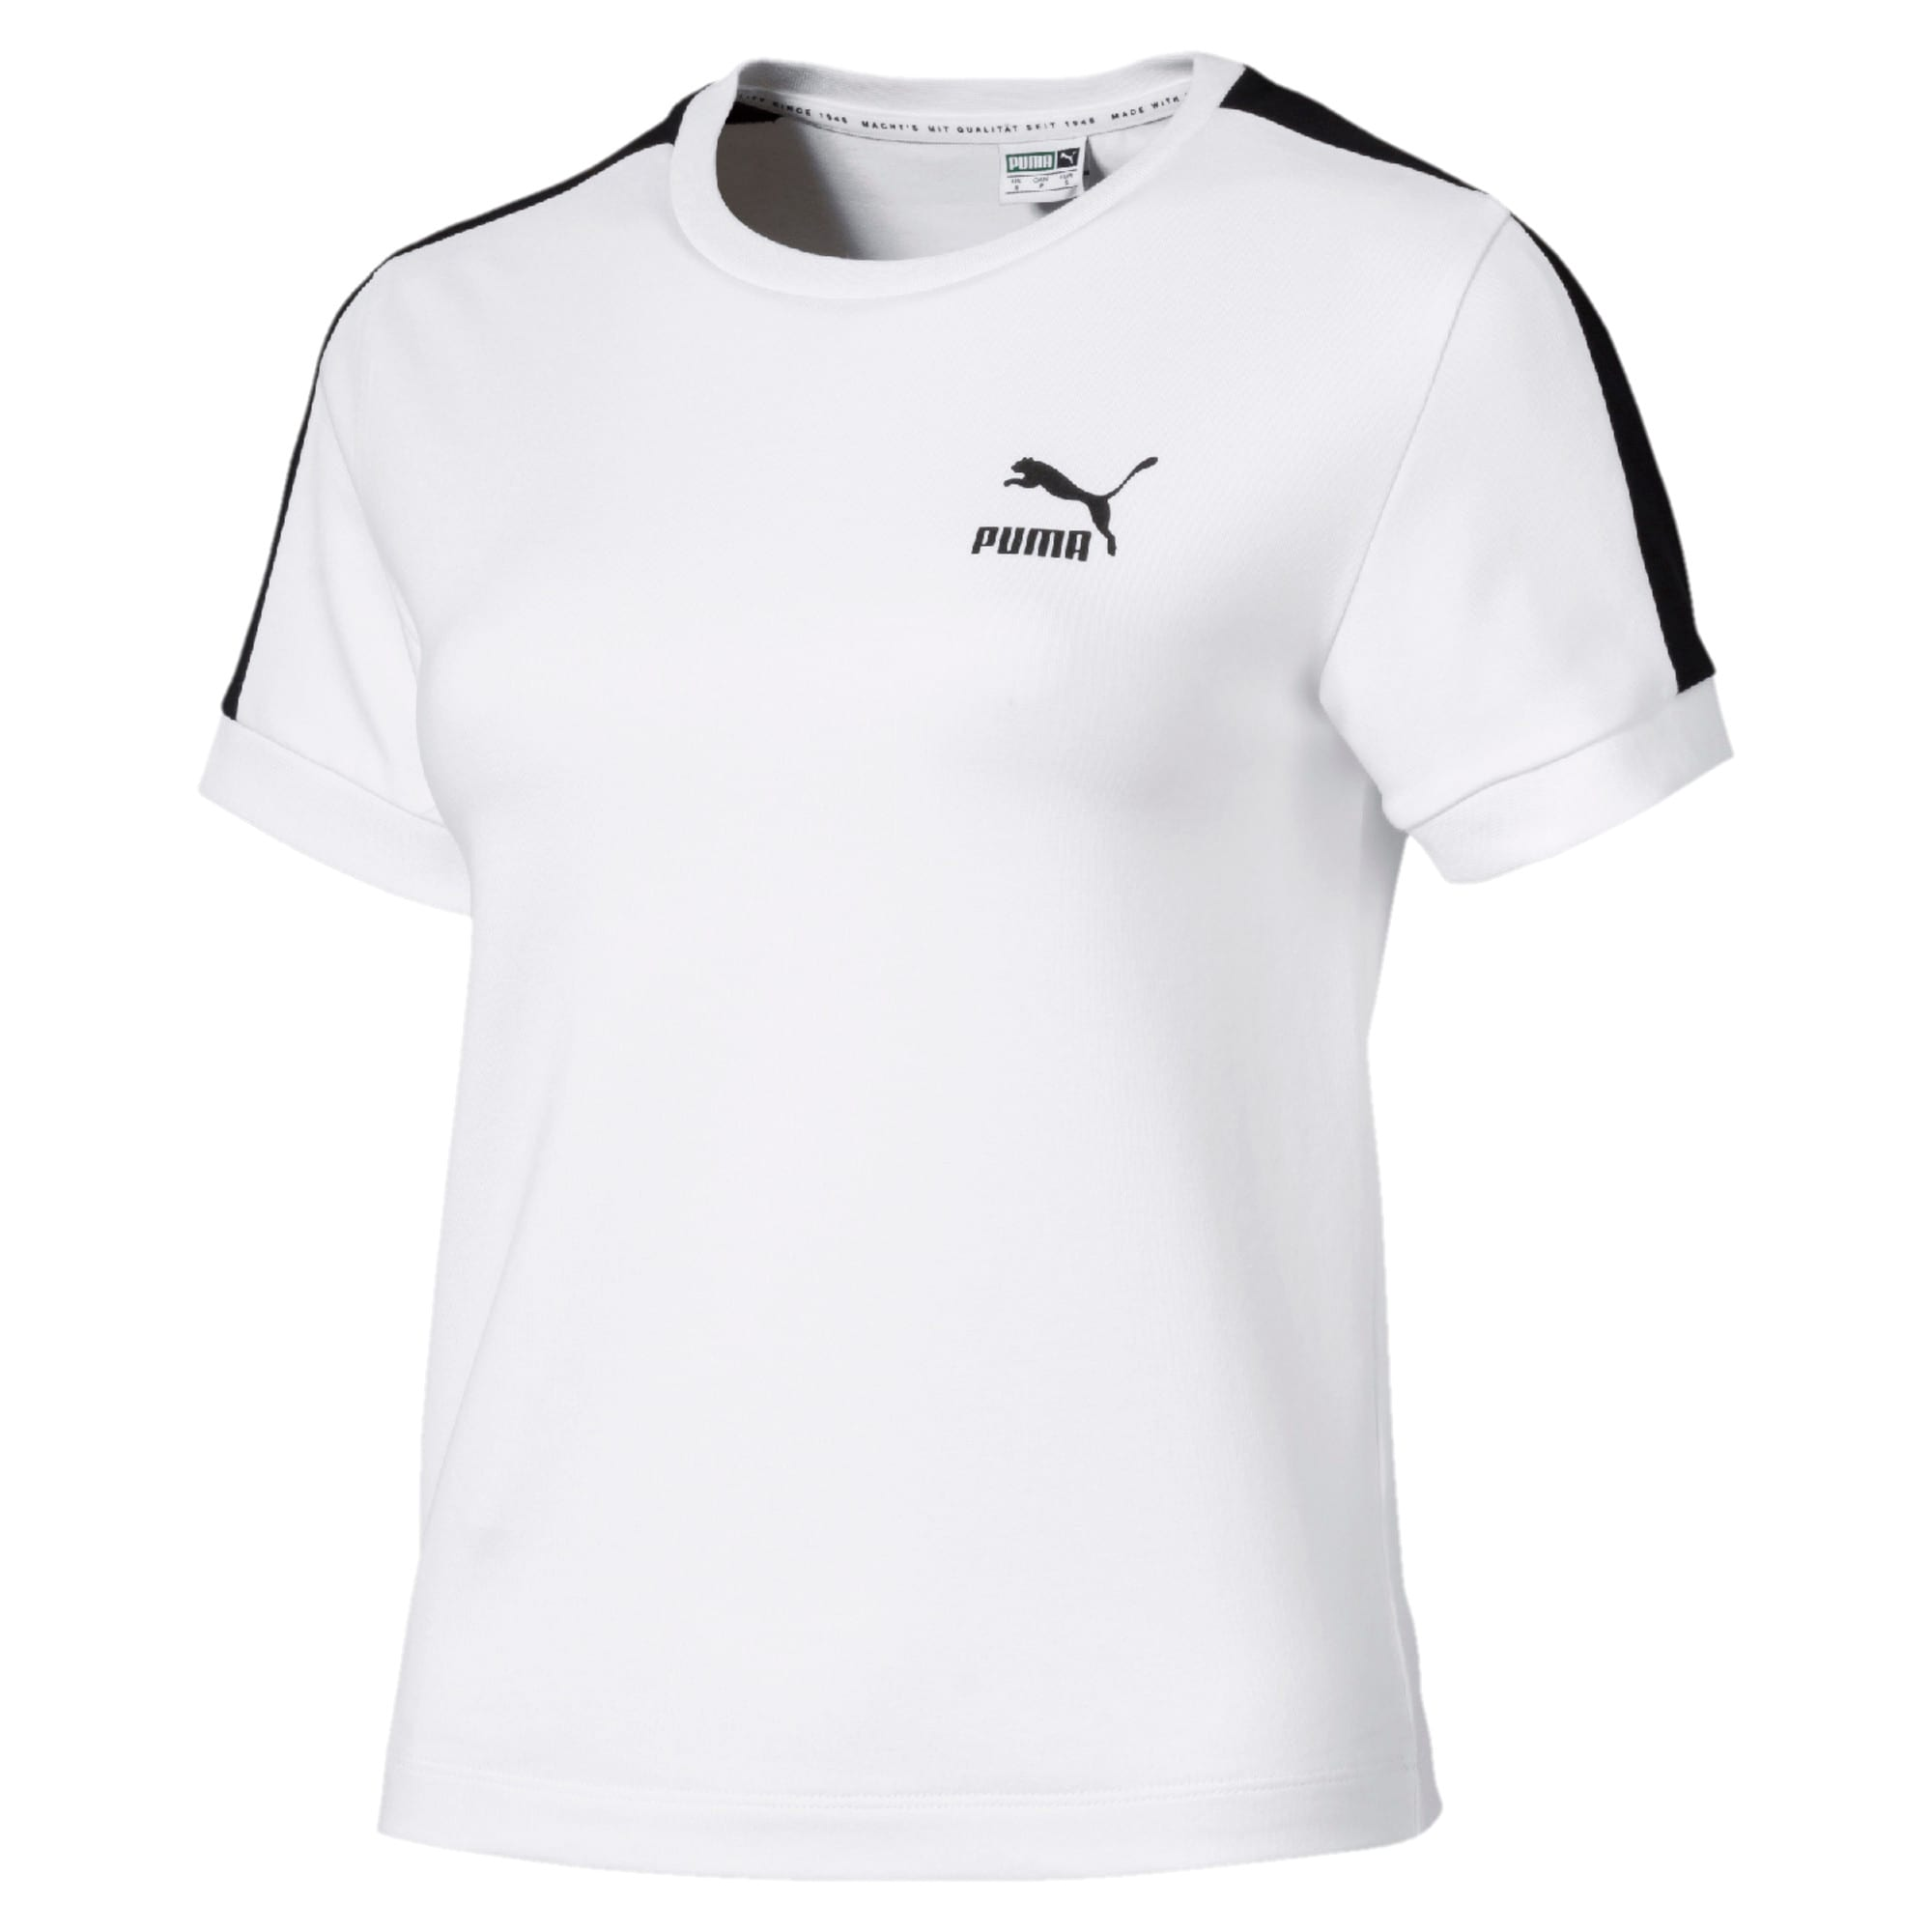 Thumbnail 1 of CLASSICS タイト ウィメンズ SS Tシャツ 半袖, Puma White-black, medium-JPN